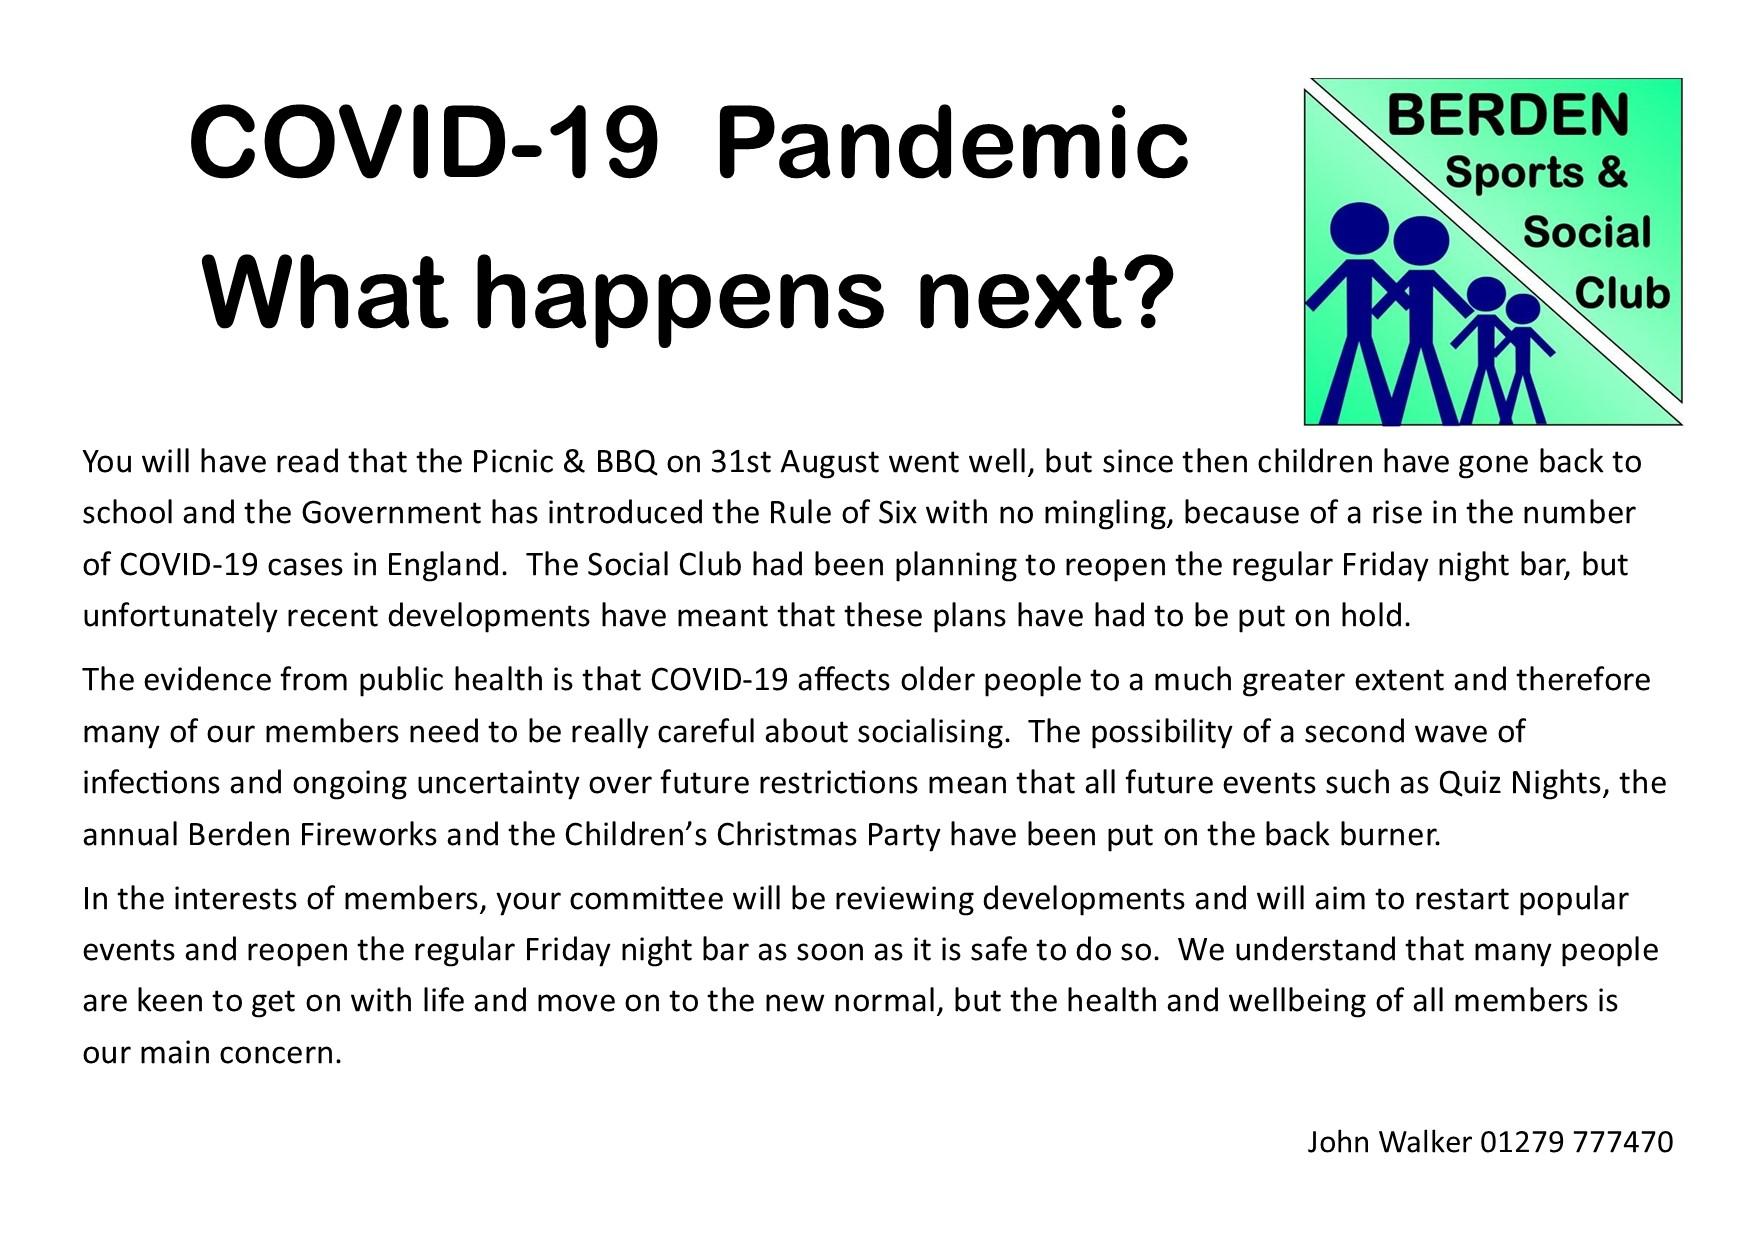 COVID-19 Parish News Item